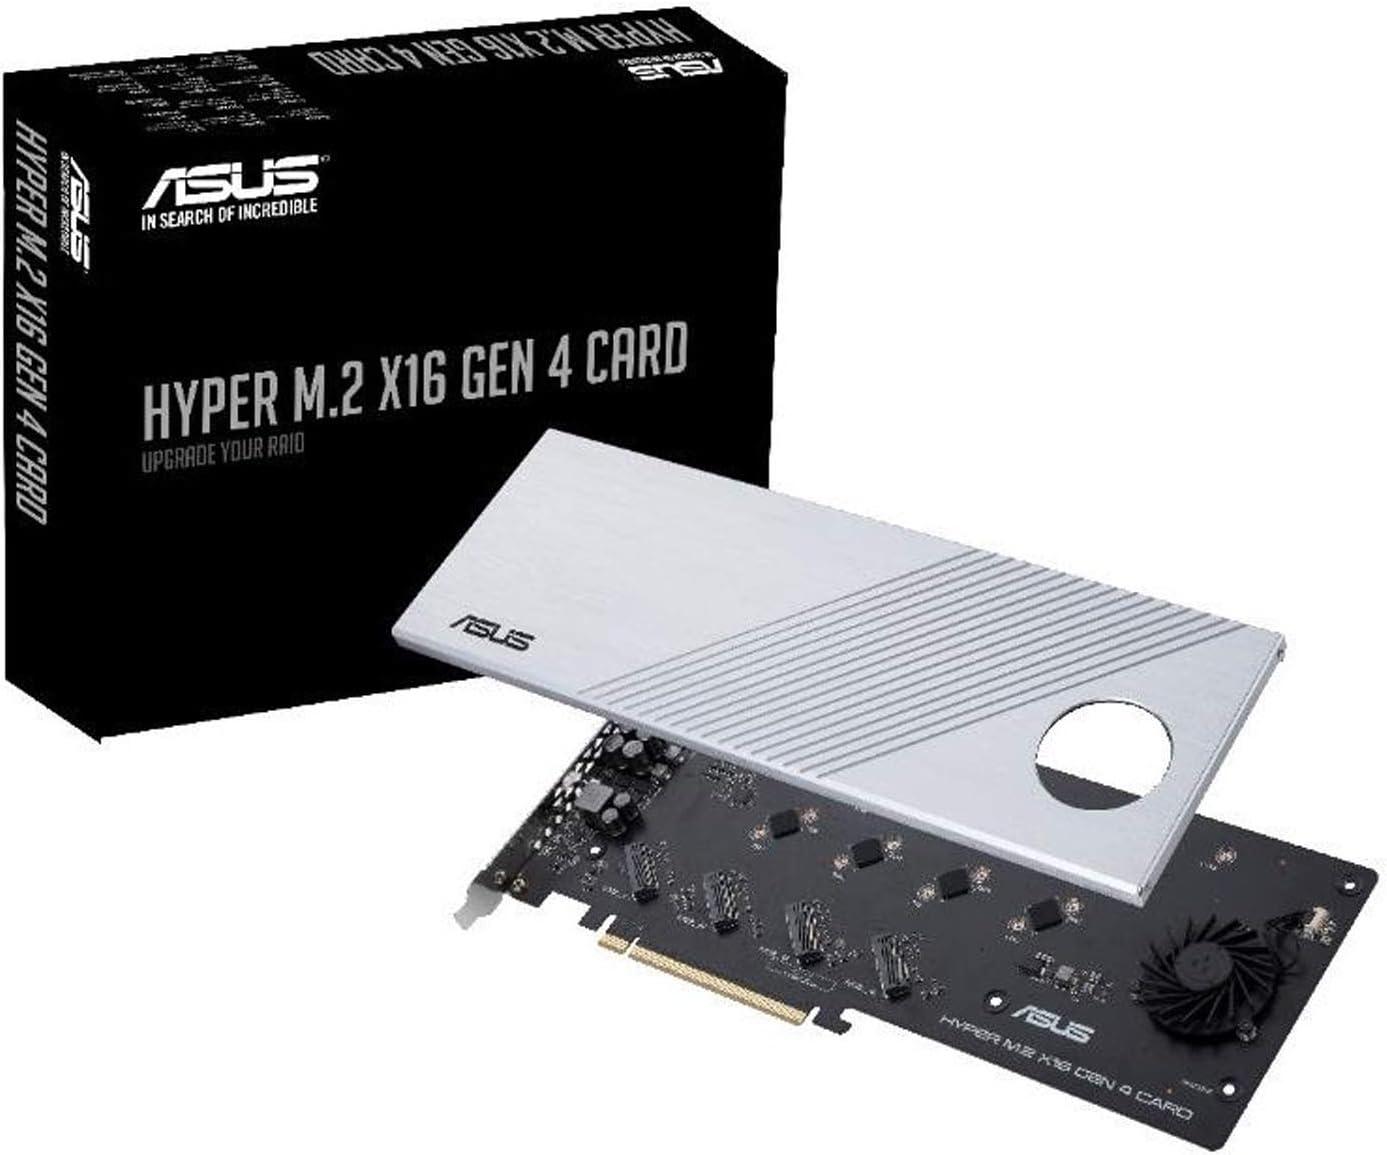 ASUS Hyper X16 PCIe 4.0 X4 4 NVMe M.2 RAID INTEL VROC AMD